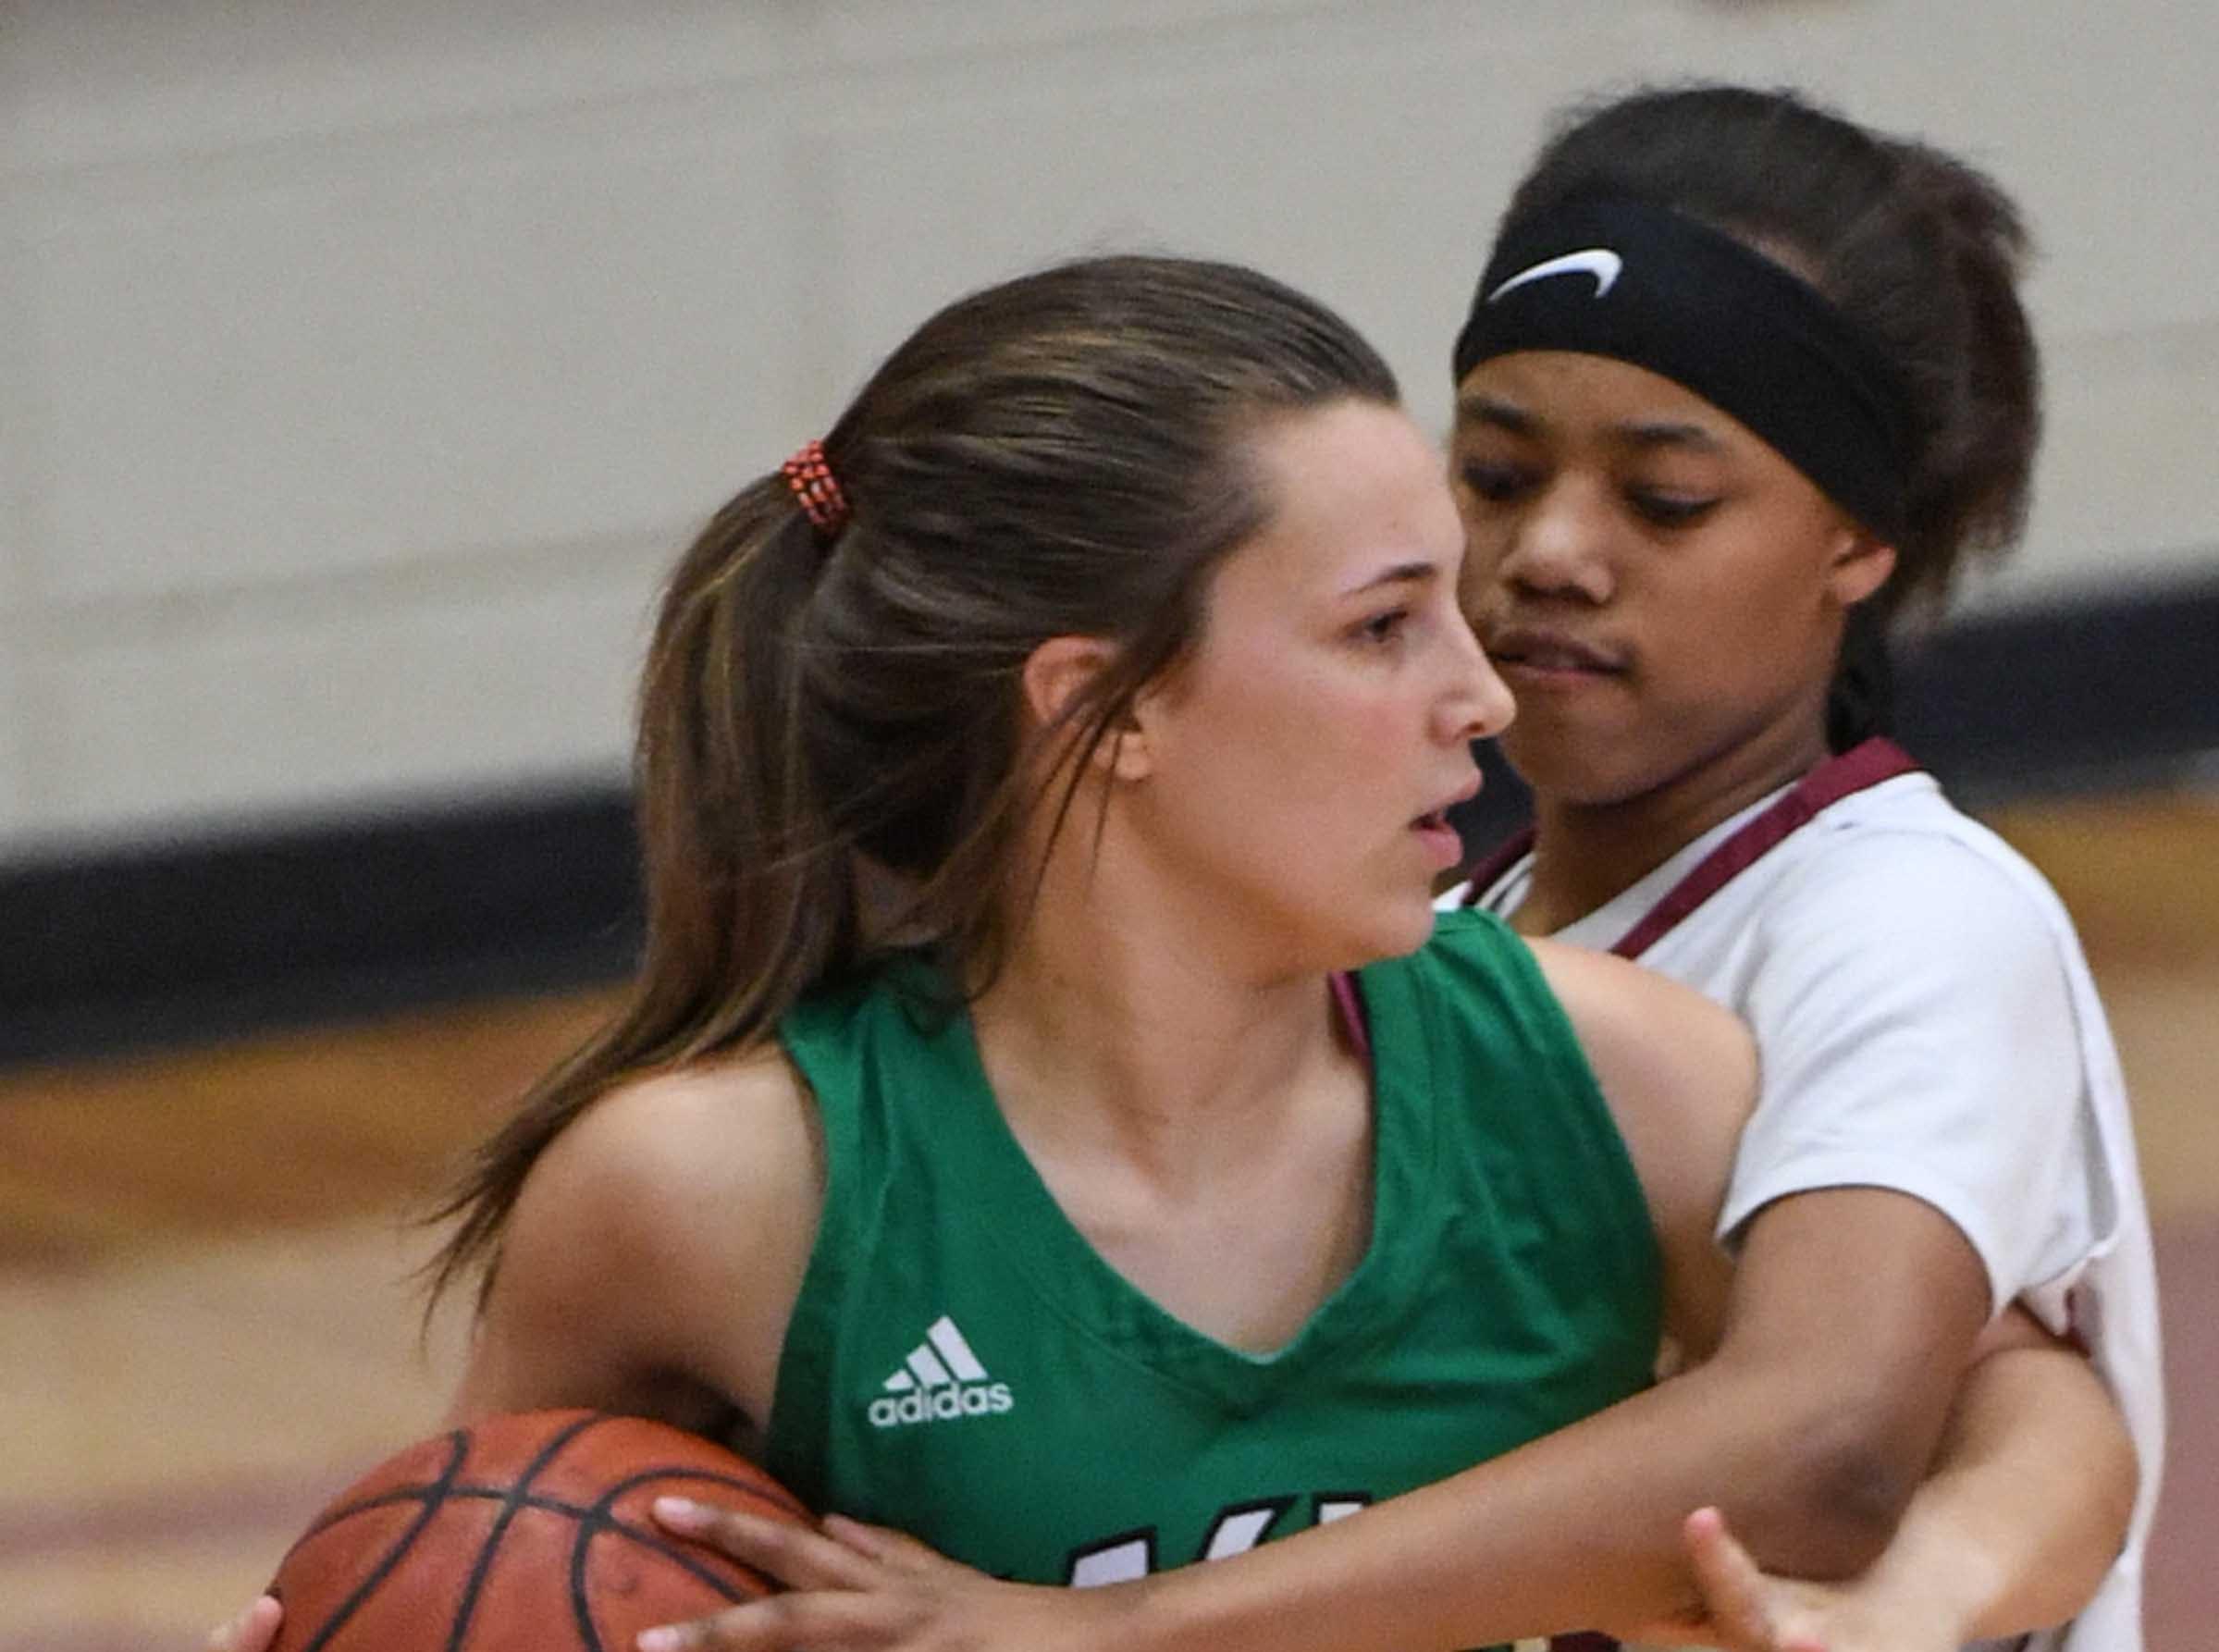 Easley senior Aubrey Lewis(10) is pressured by Westside sophomore Khia Pickens(13) during the second quarter at Westside High School in Anderson on Friday.